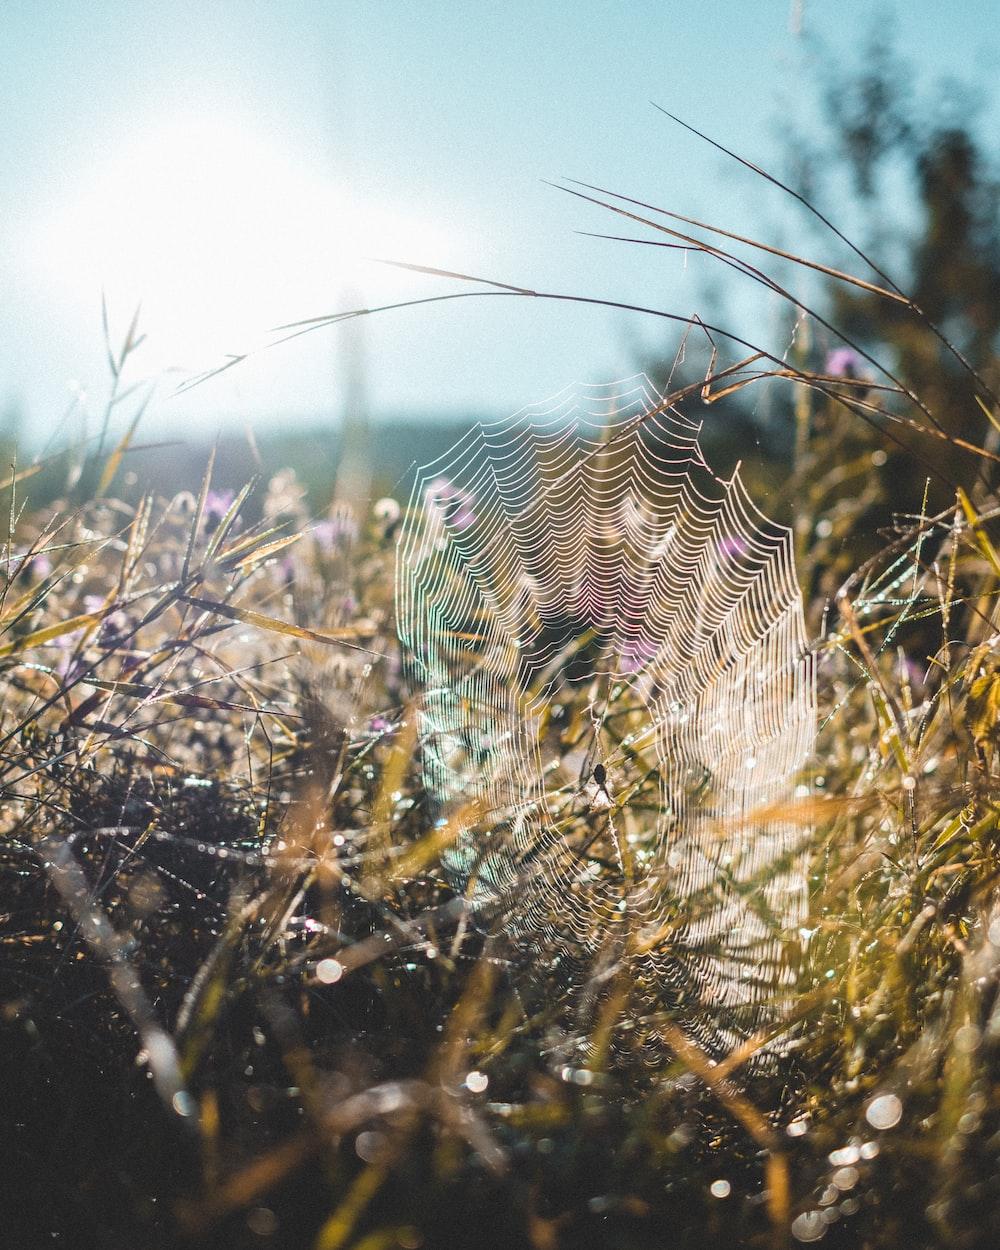 spider web near plants